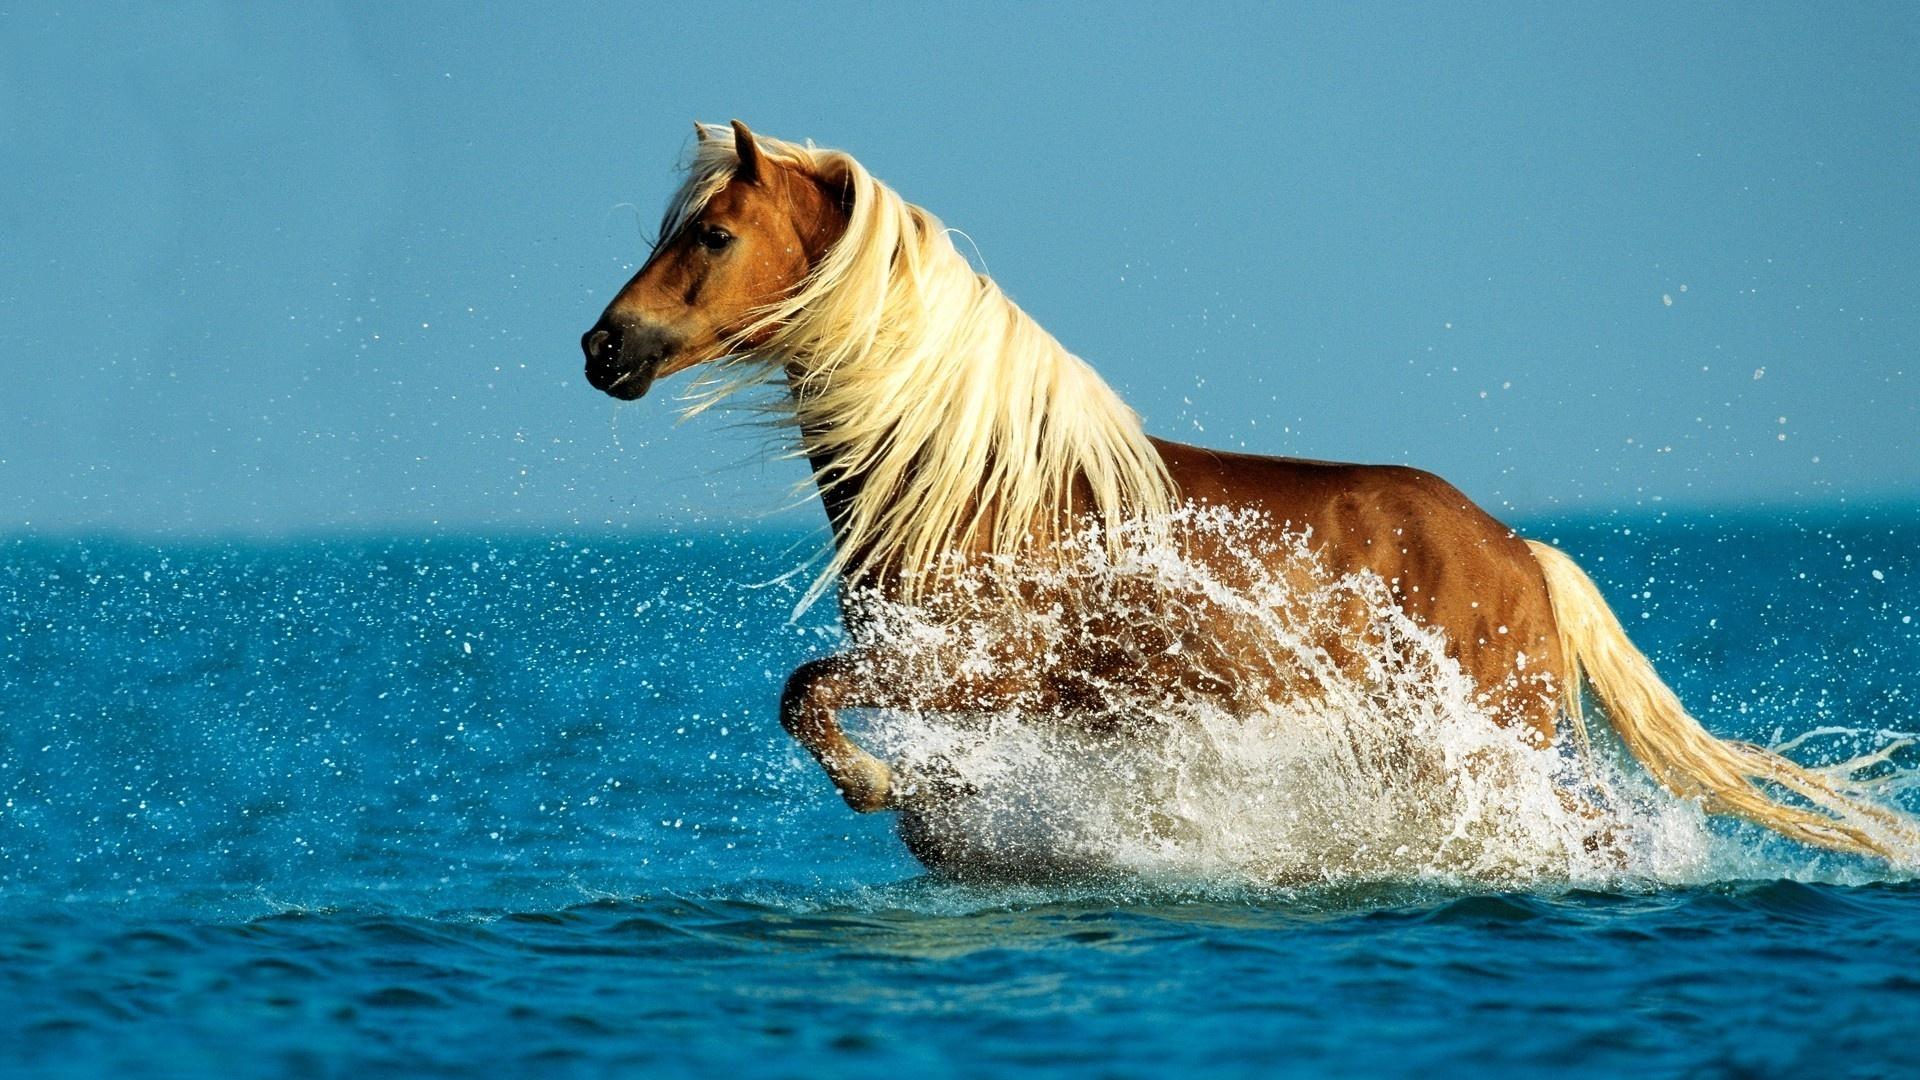 10 Most Popular Wild Animals Wallpapers Free Download Full: 壁紙 水で走る馬 1920x1200 HD 無料のデスクトップの背景, 画像